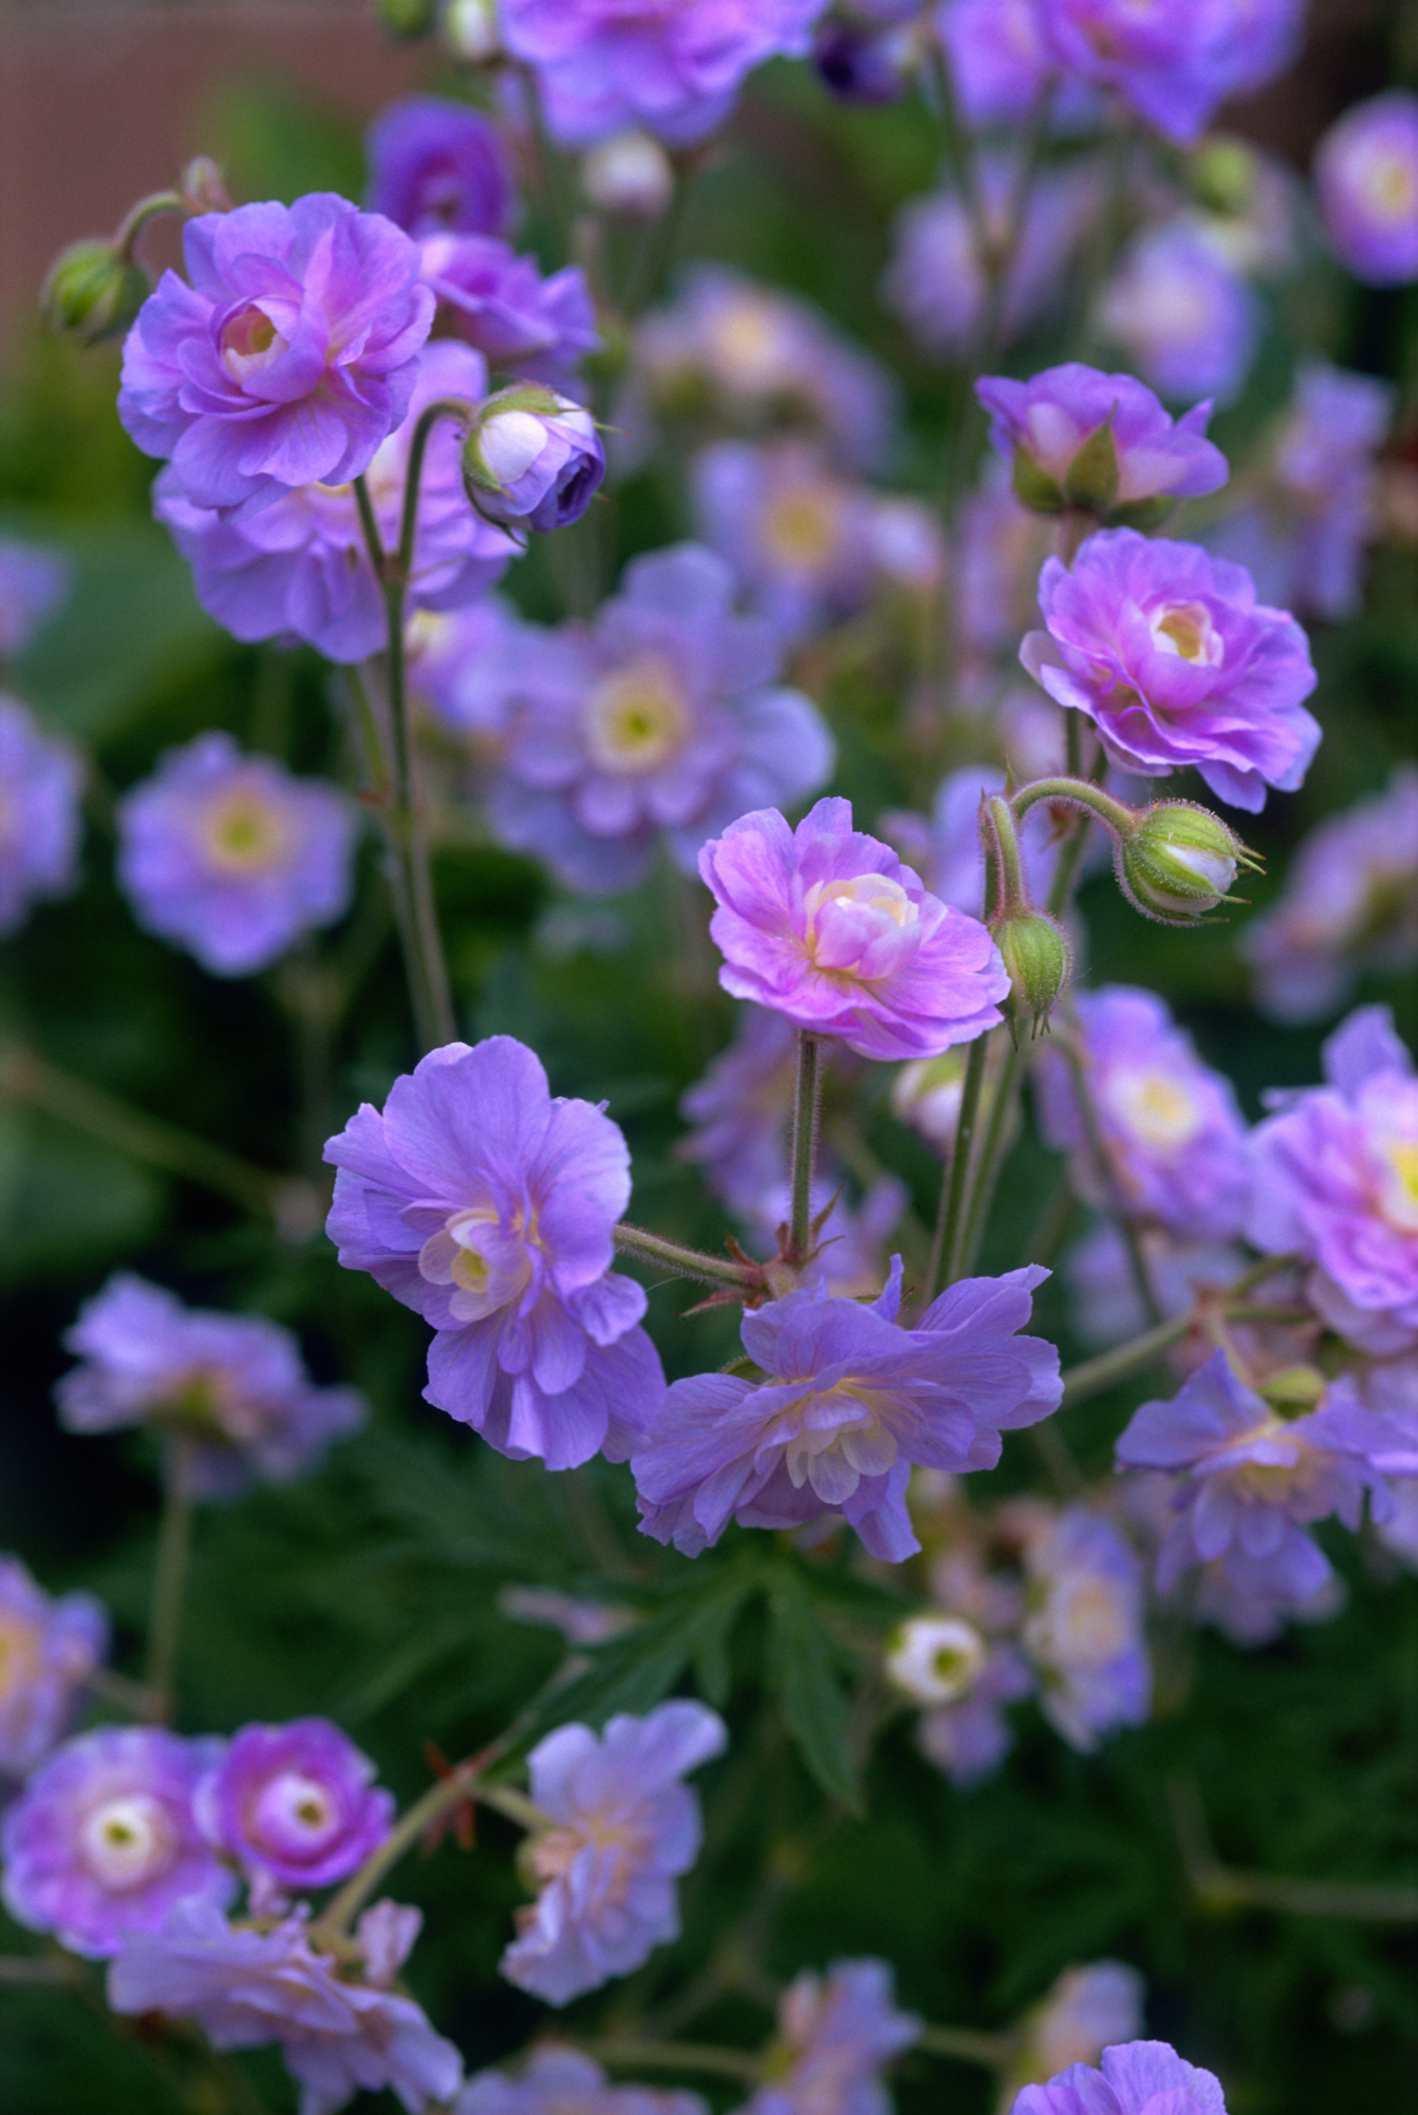 'Summer Skies' geranium with purple flowers